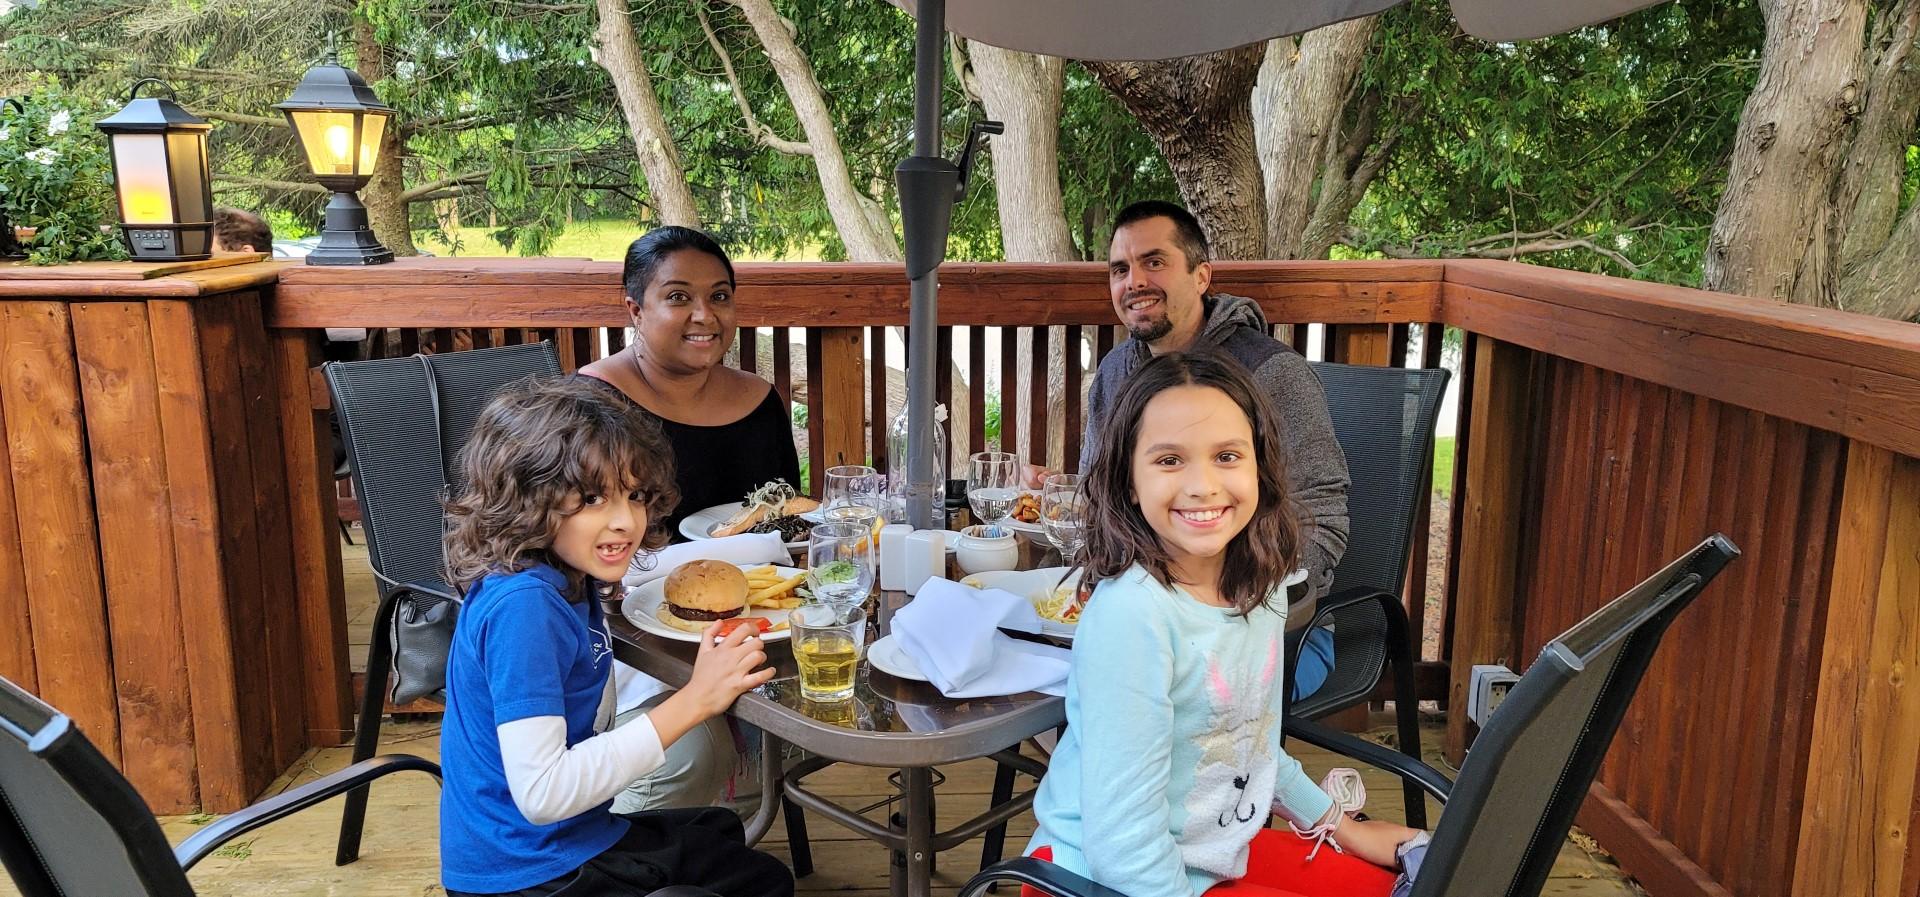 Mixed family enjoying dinner on a patio